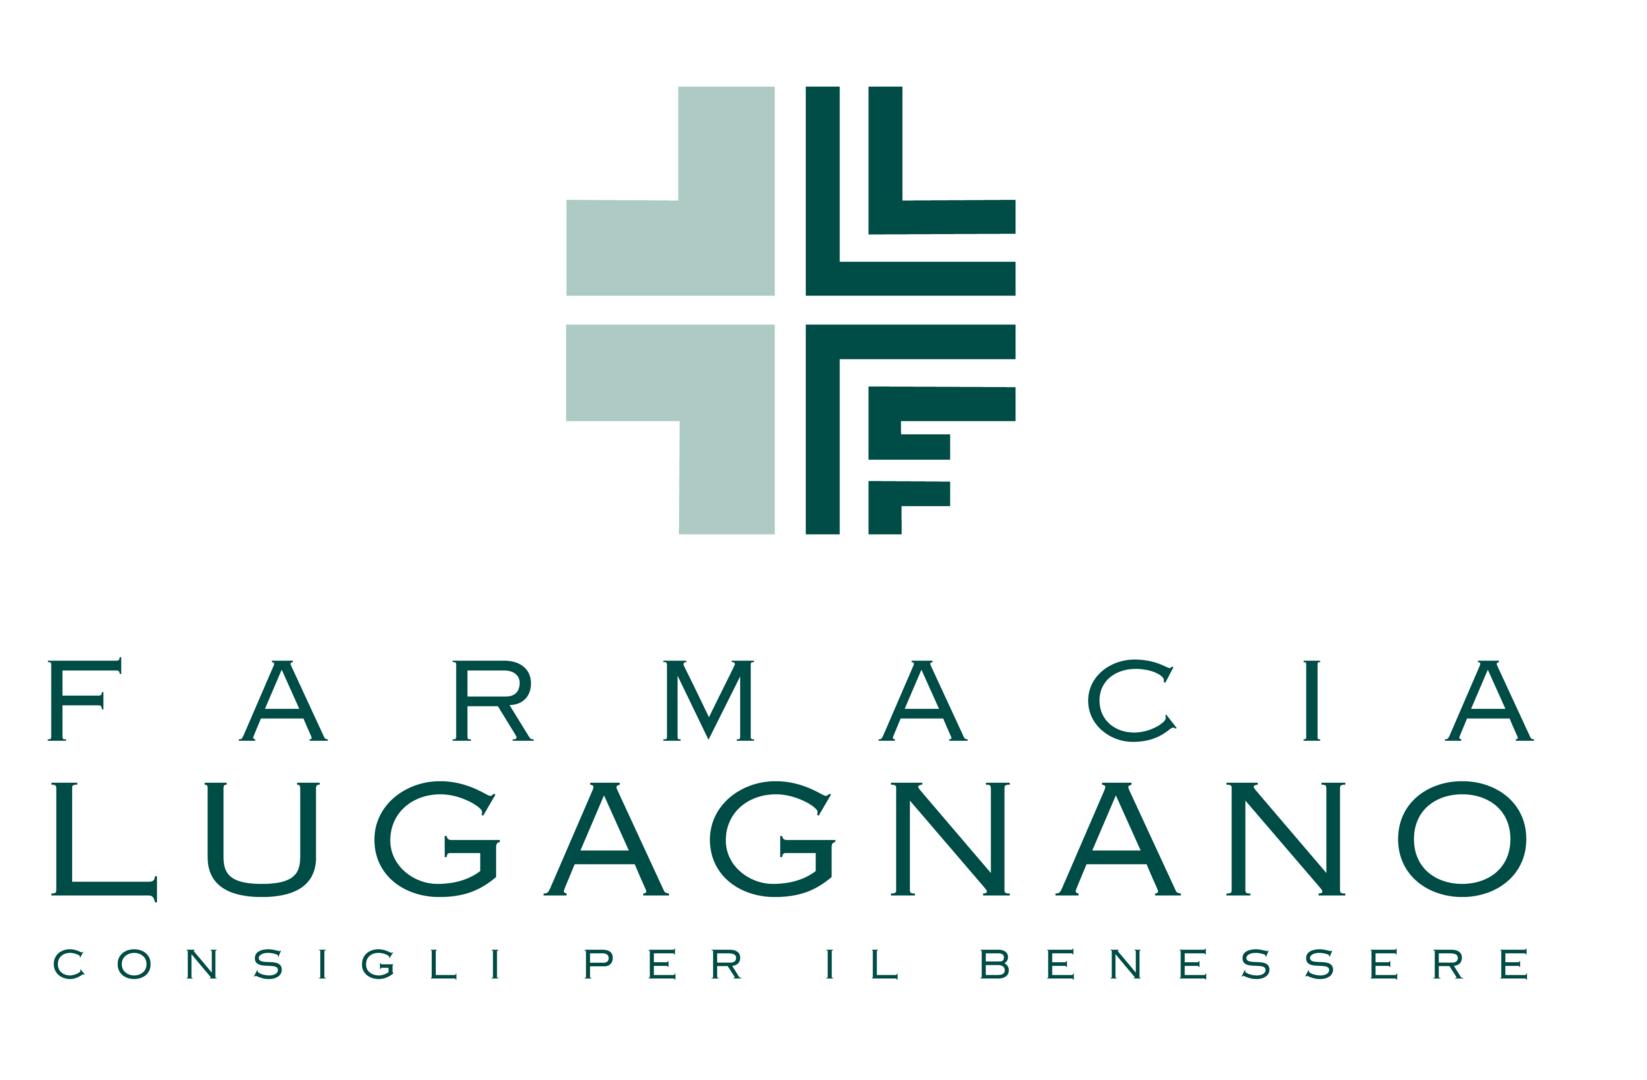 logo Lugagnano pant (1)